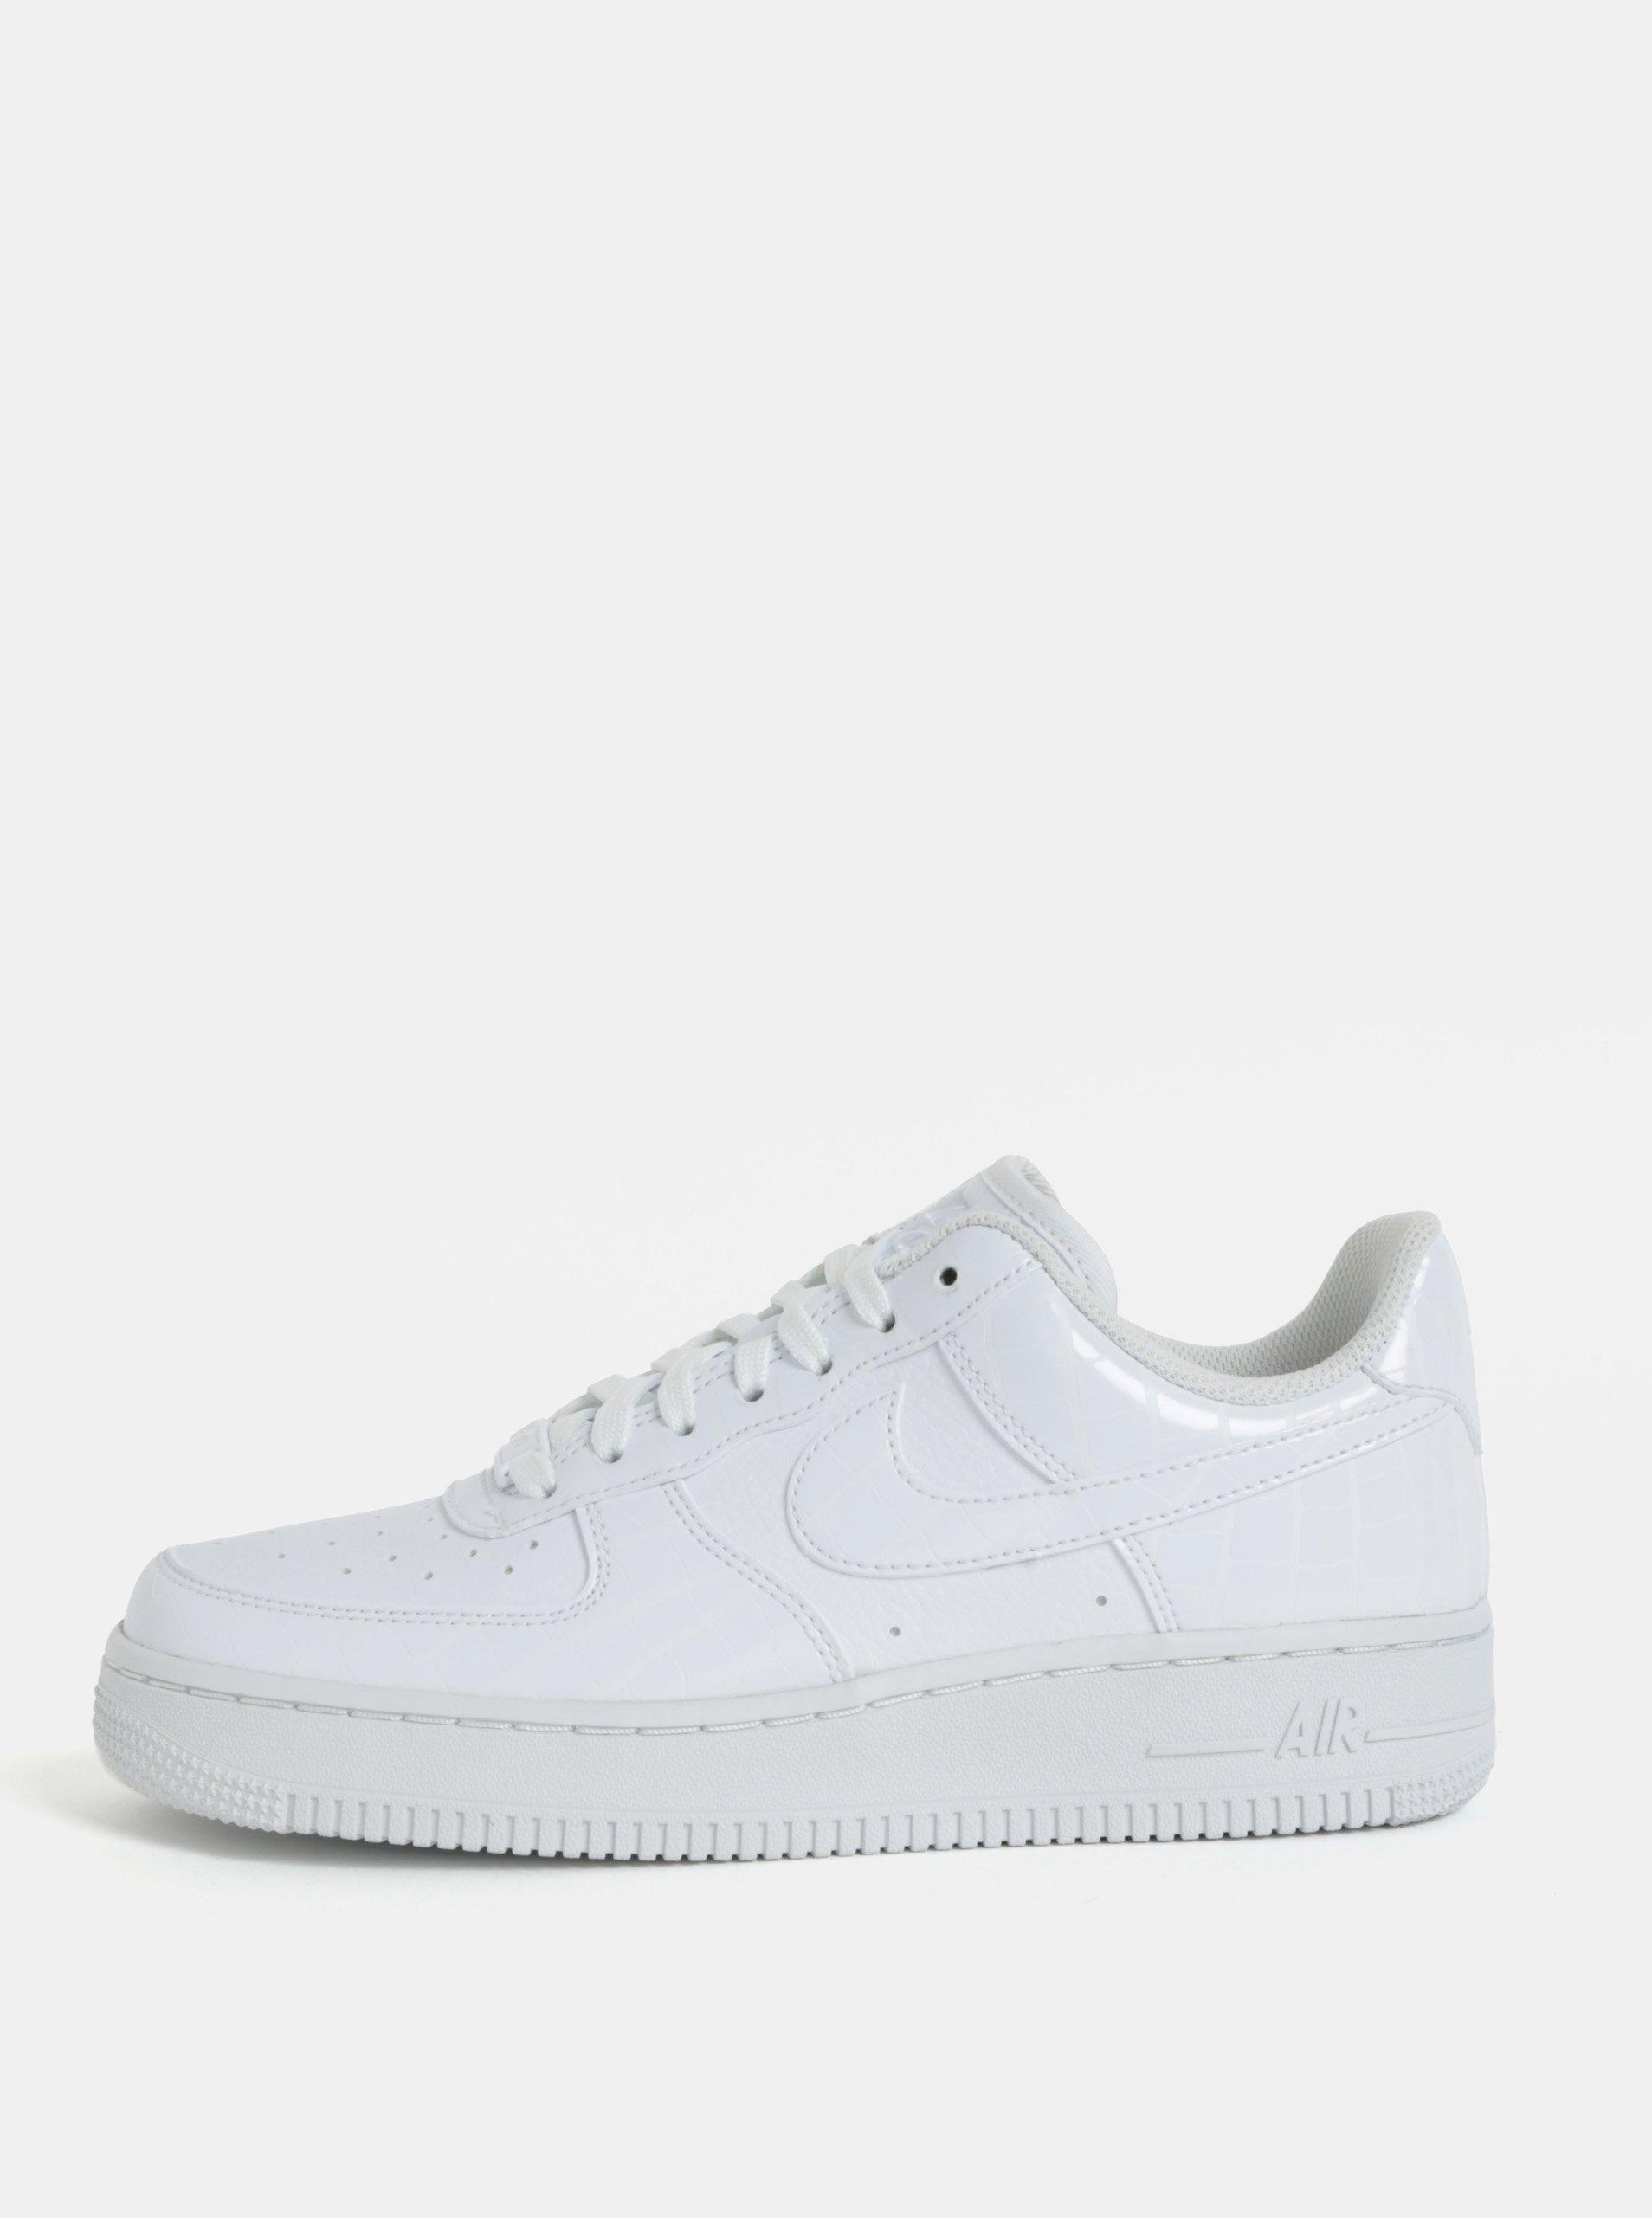 665d0e36448b Biele dámske tenisky na platforme Nike Air Force1